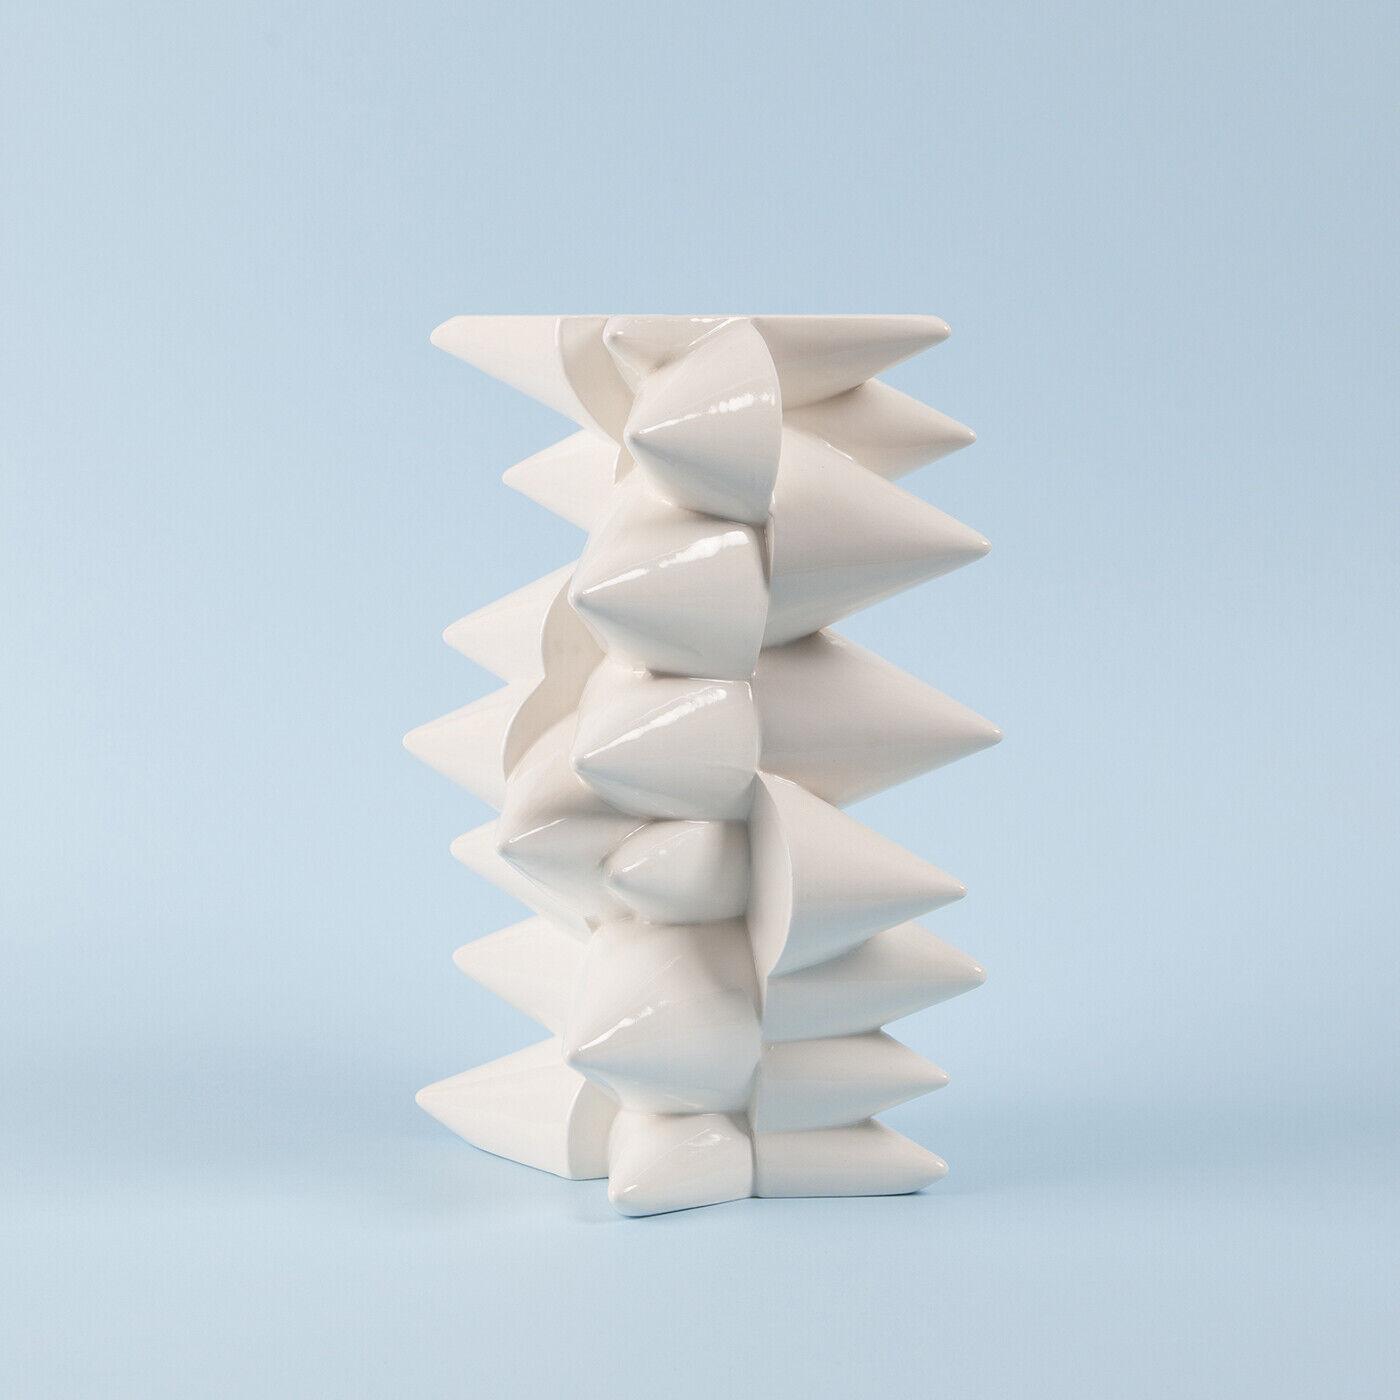 Contemporary Handmade Ceramic Vase, Slip Casted, Weiß with Clear Glaze